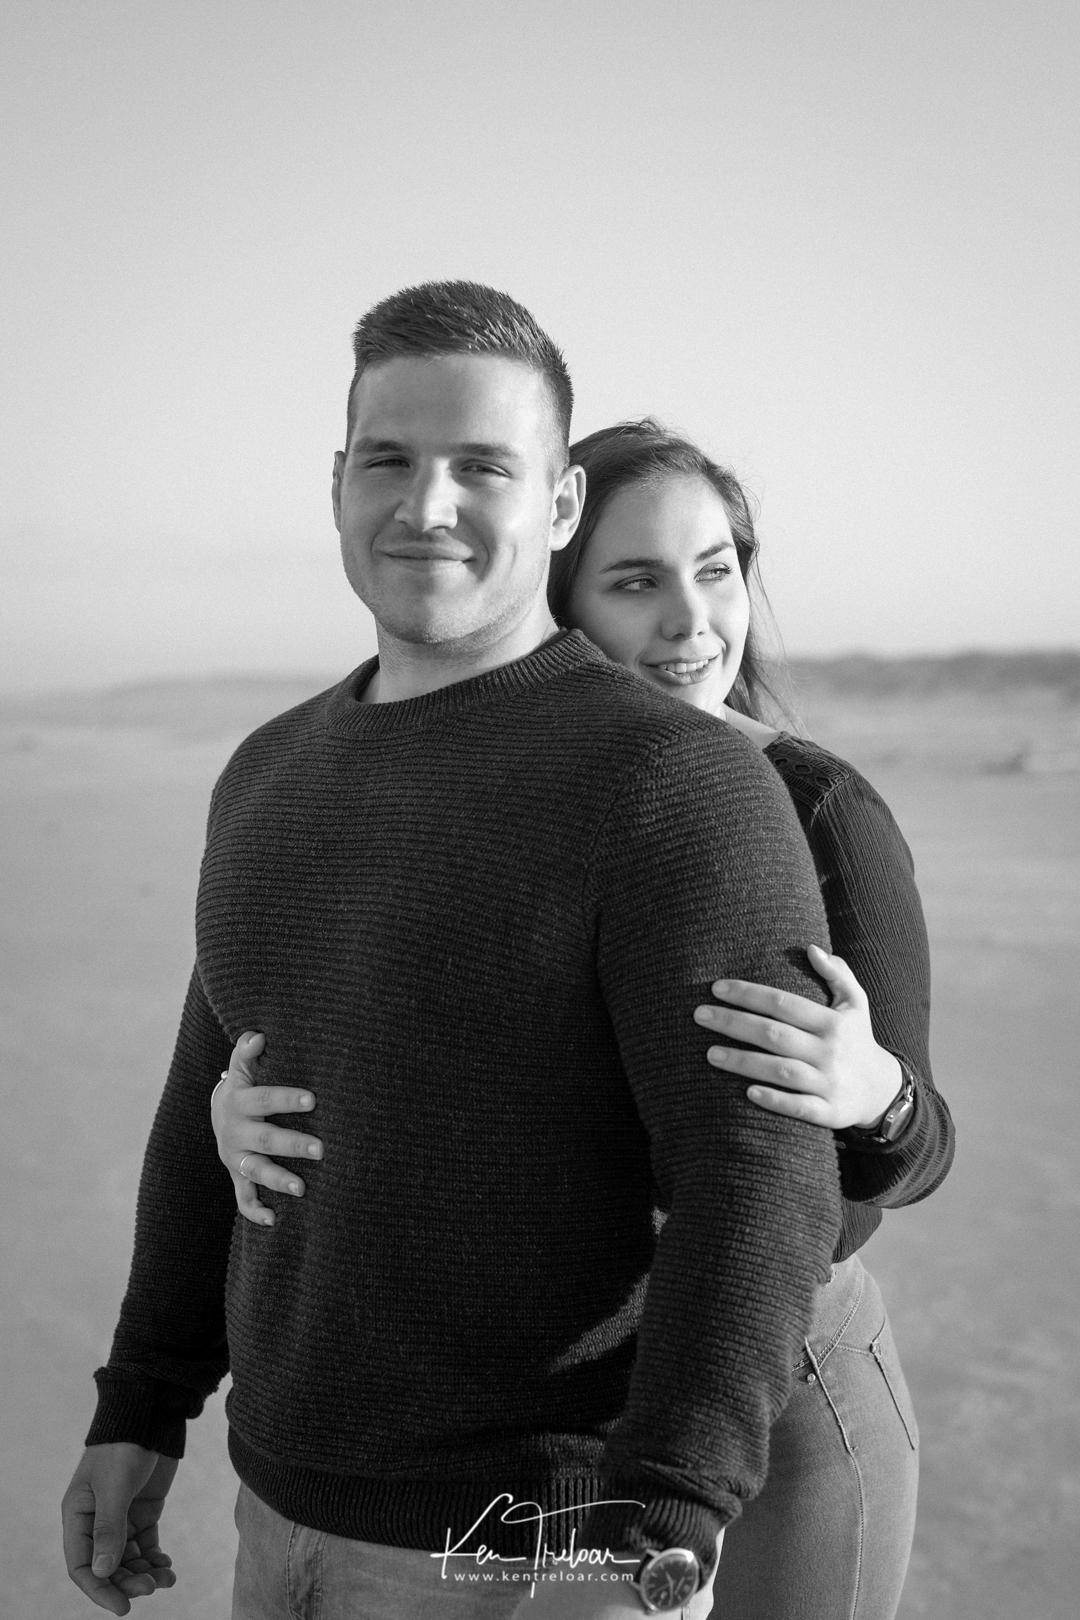 Ken Treloar - Romantic Couples photoshoot Cape Town 2019-20.jpg